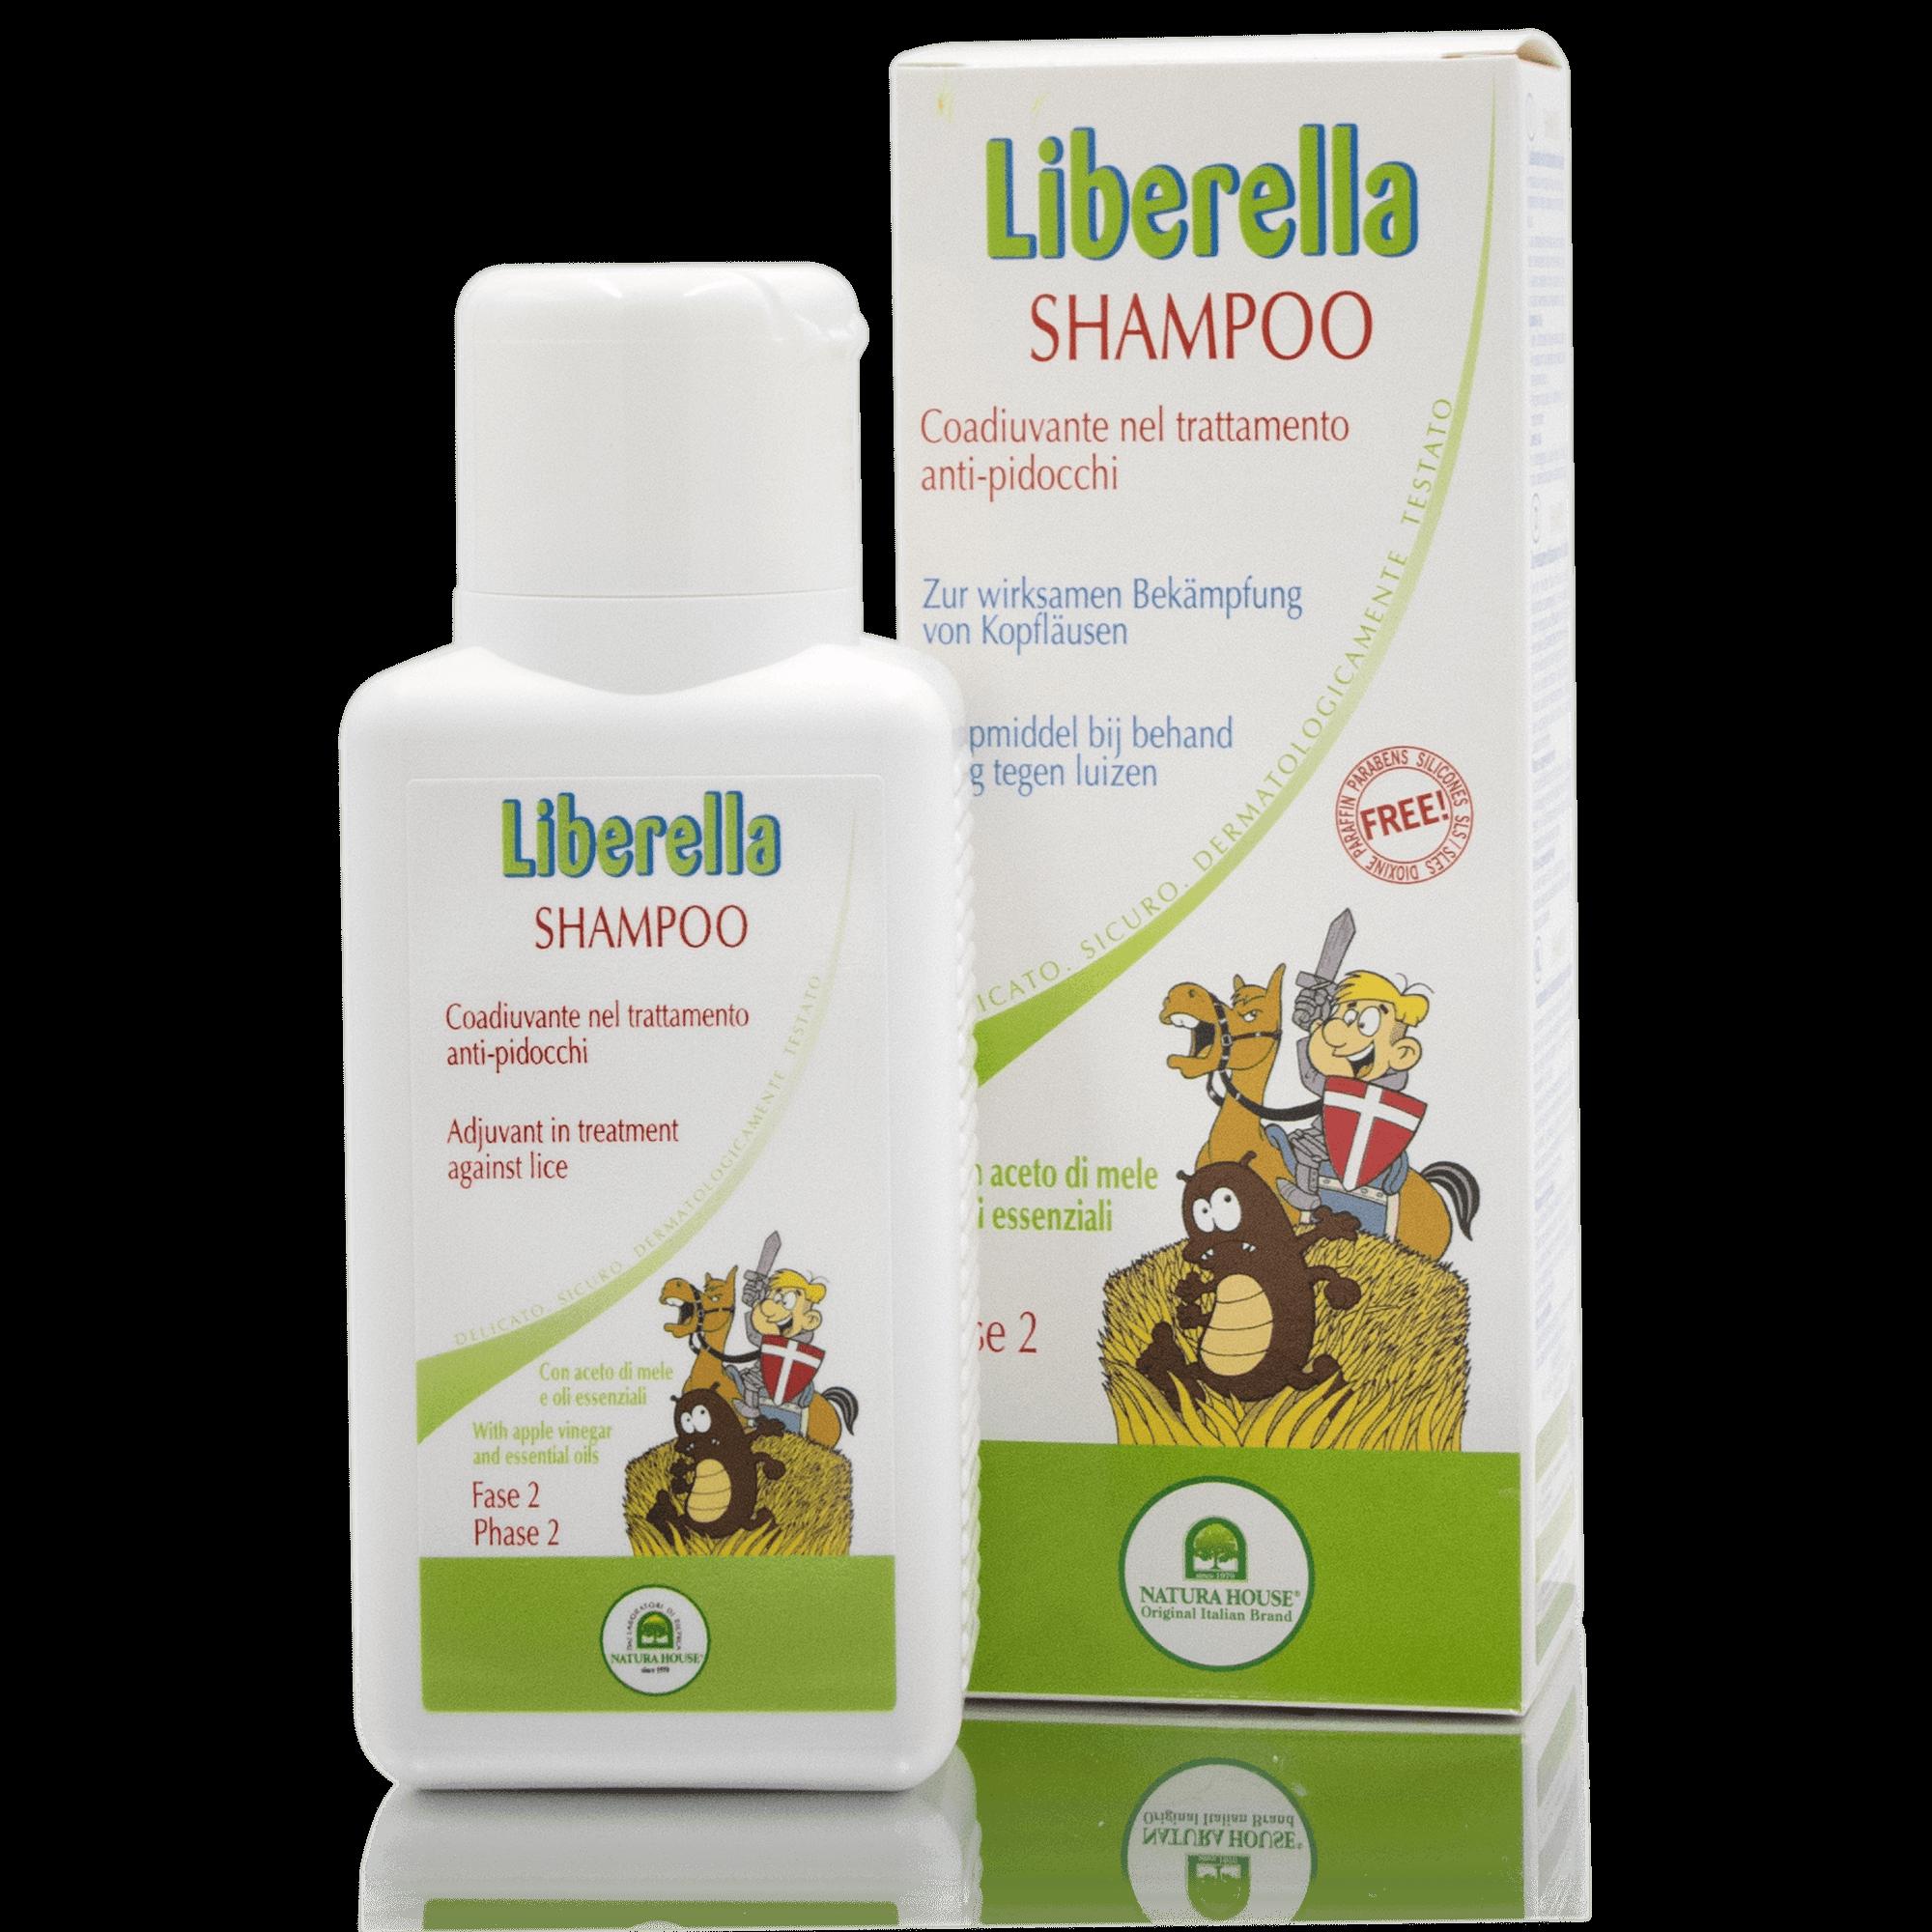 Shampoo Anti-pidocchi - Natura House